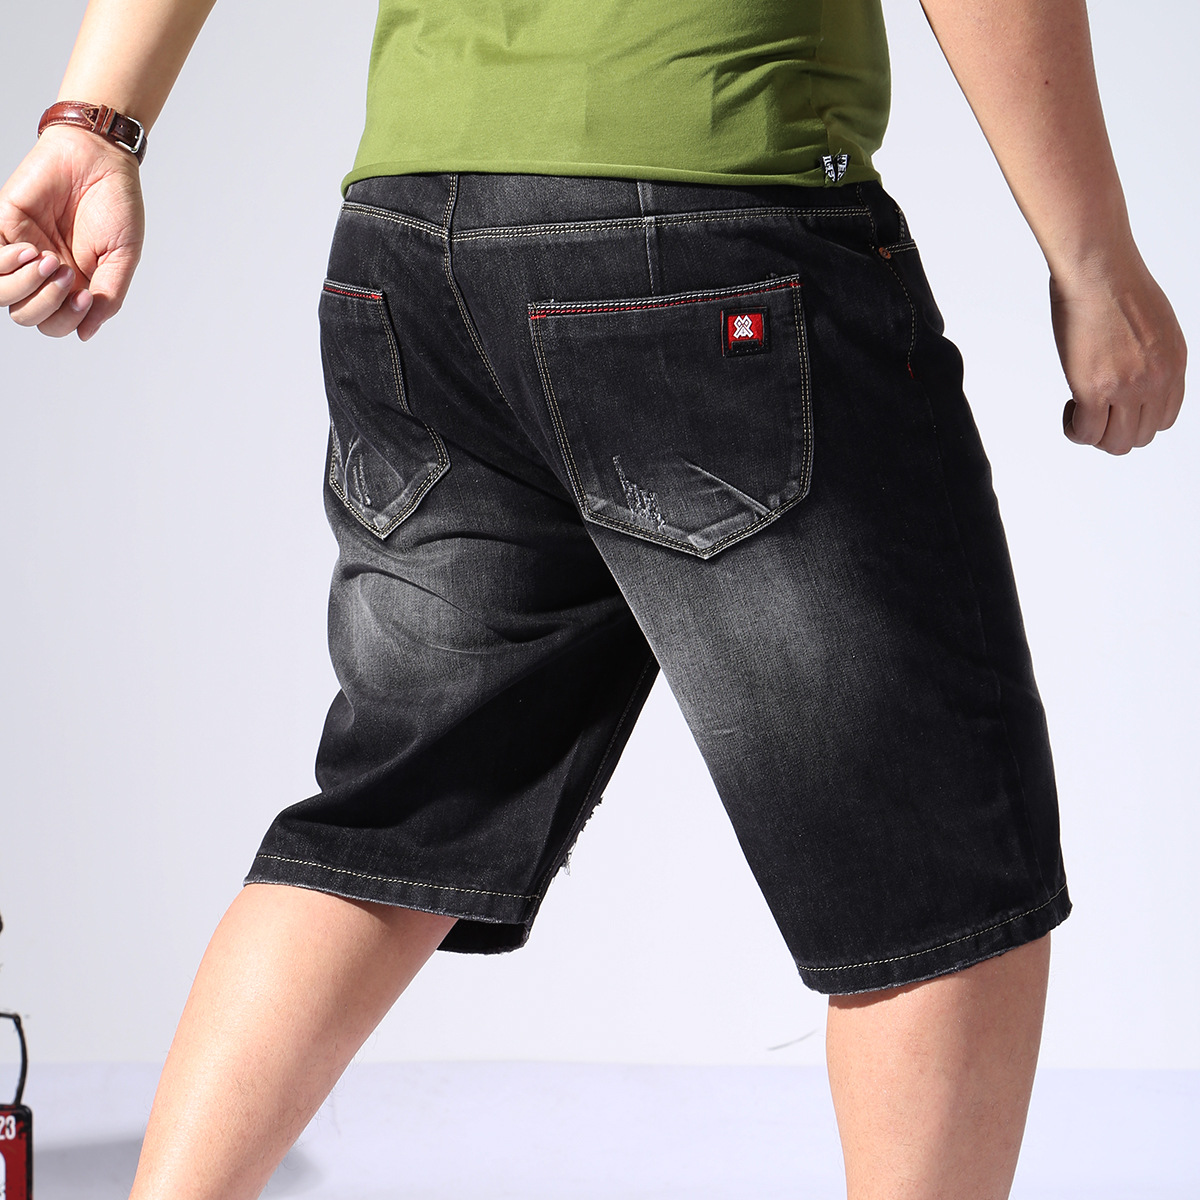 Jeans Shorts Bermuda Big-Size Cowboy-Short-Trouser Knee-Length Male Casual Denim Hot